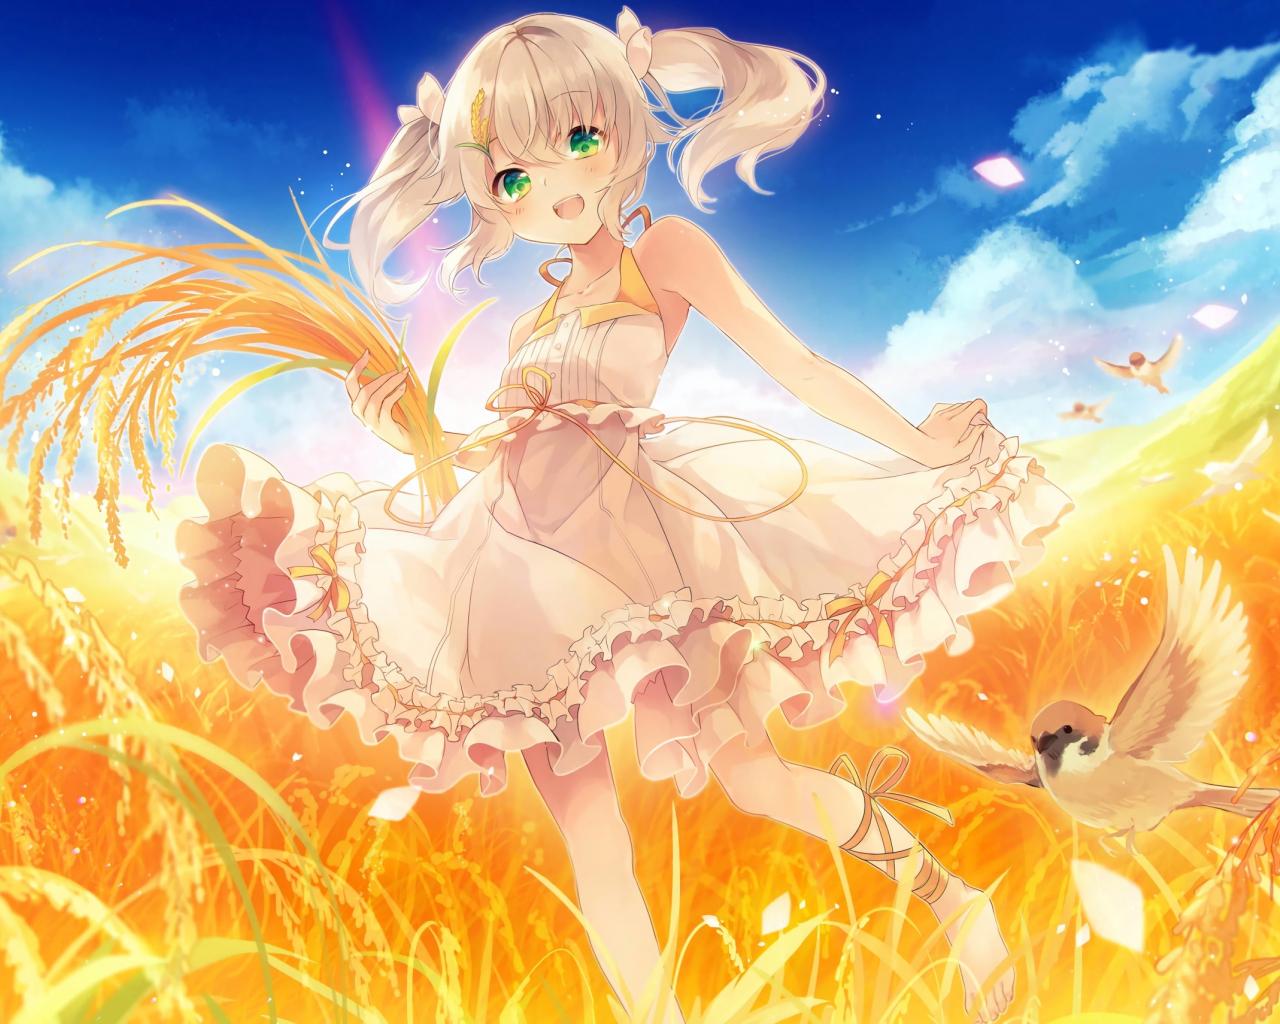 download 1280x1024 wallpaper happy blonde anime girl